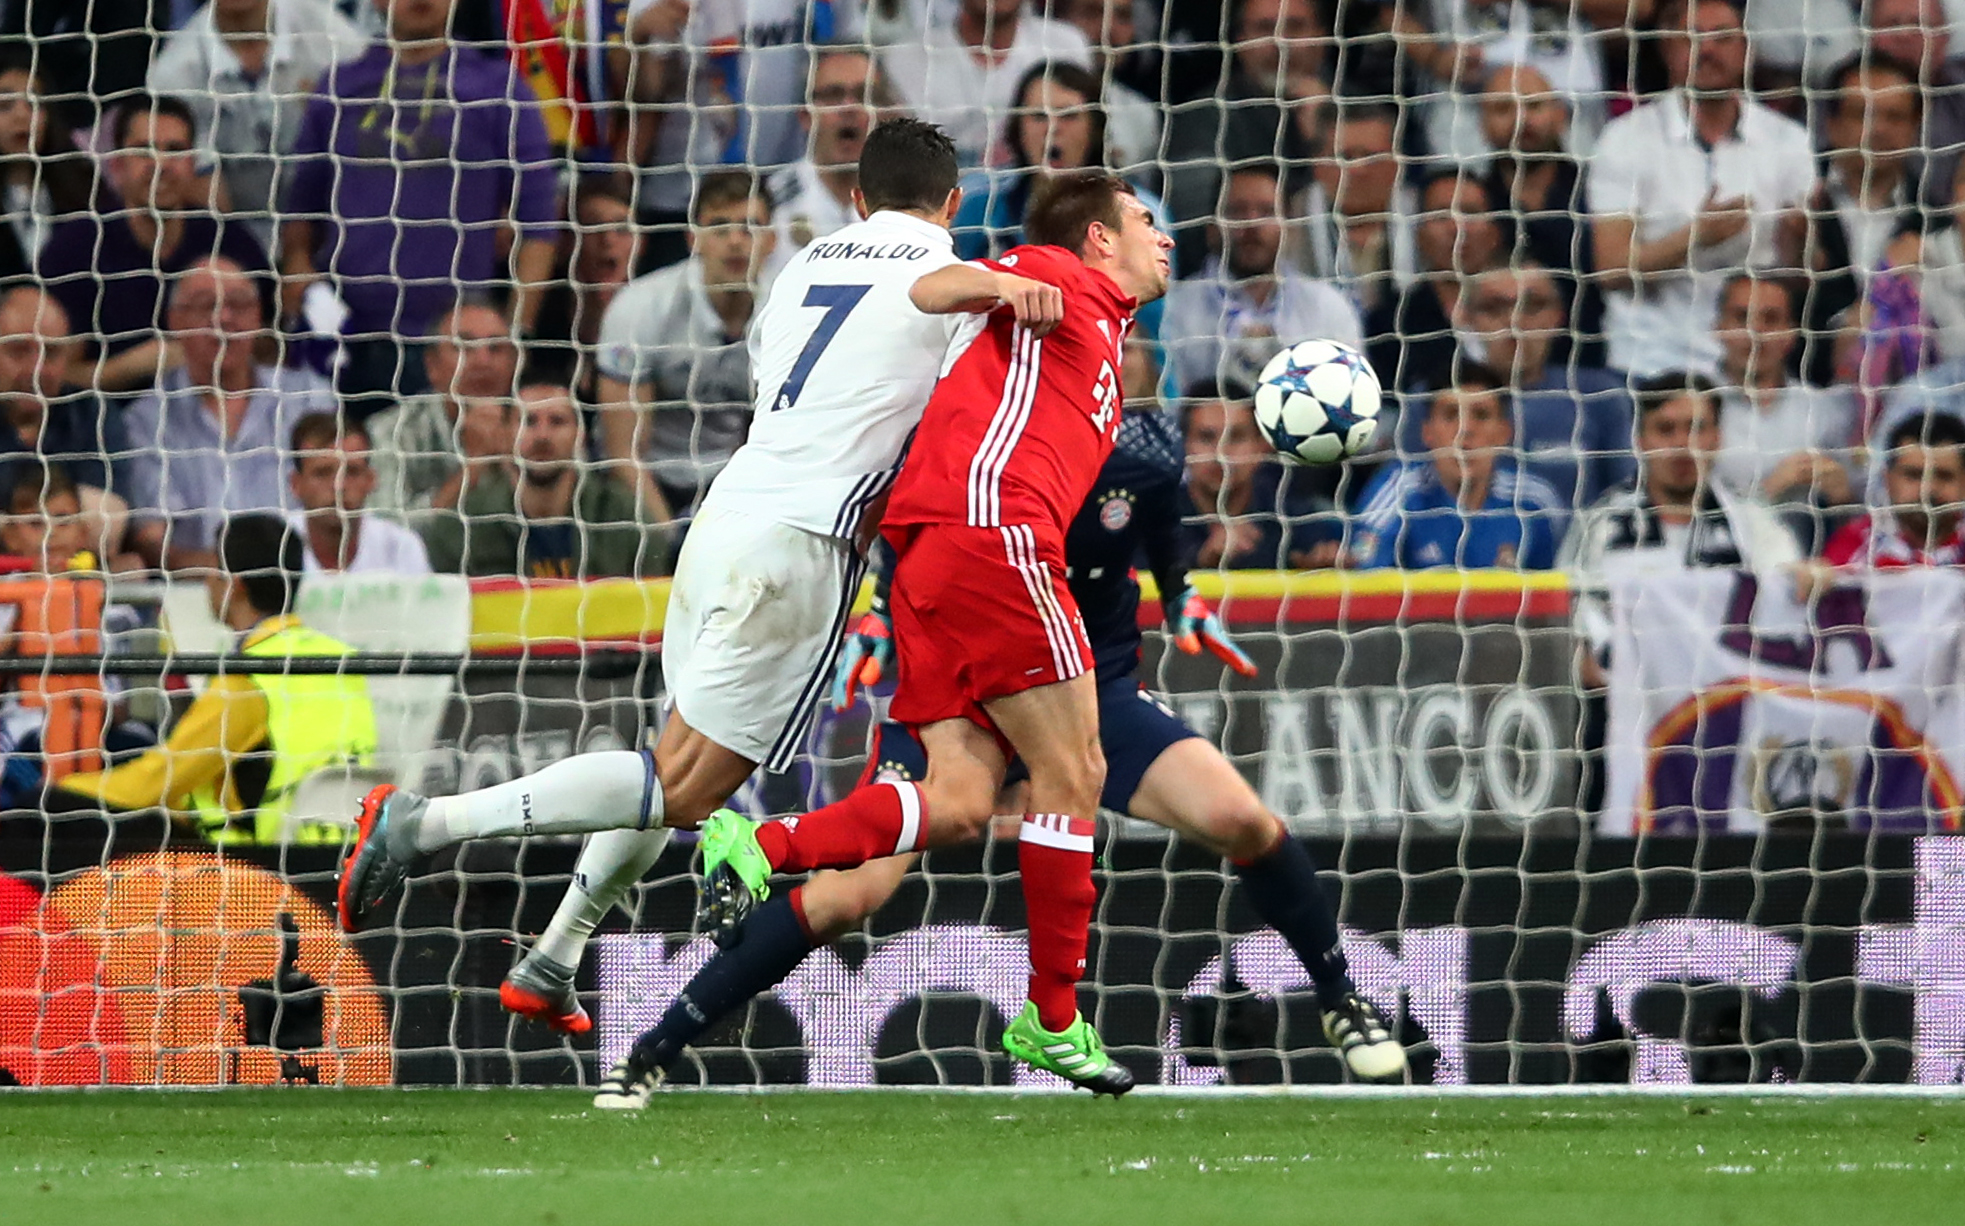 Cabeceamento de Cristiano acabou no fundo da baliza esta terça-feira no Santiago Bernabéu